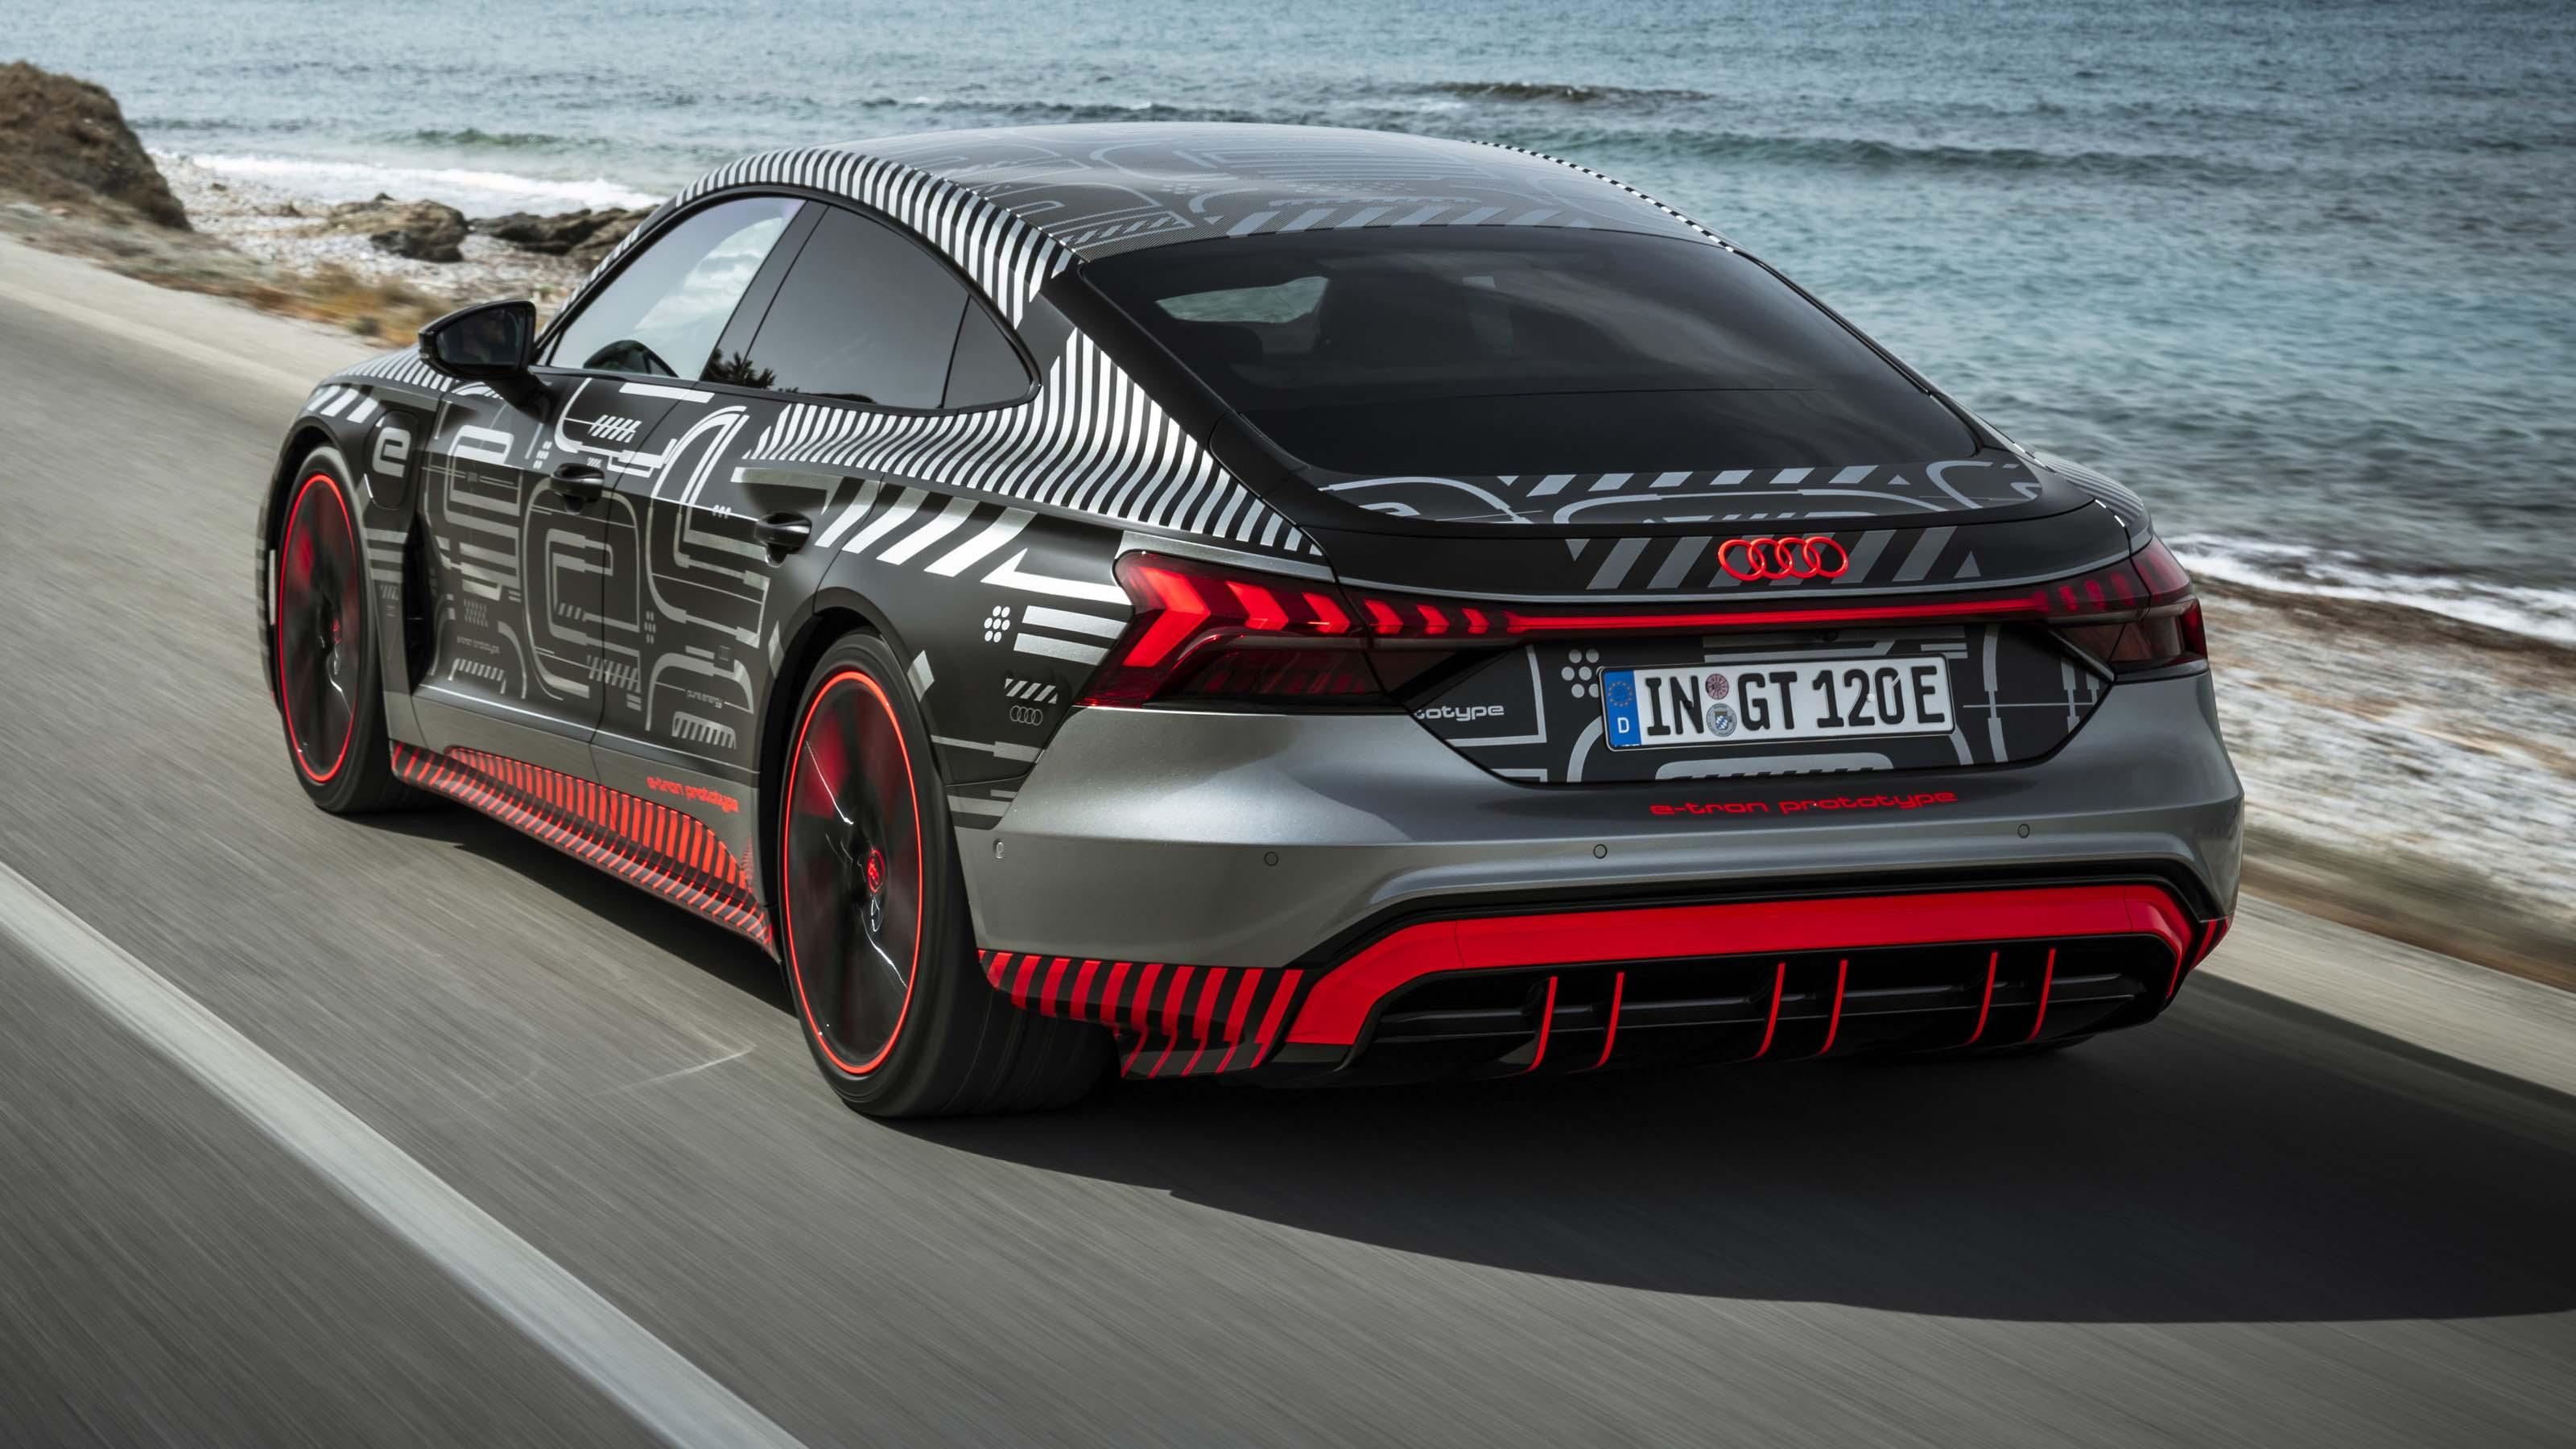 Audi e-tron GT prototype drive pictures | DrivingElectric